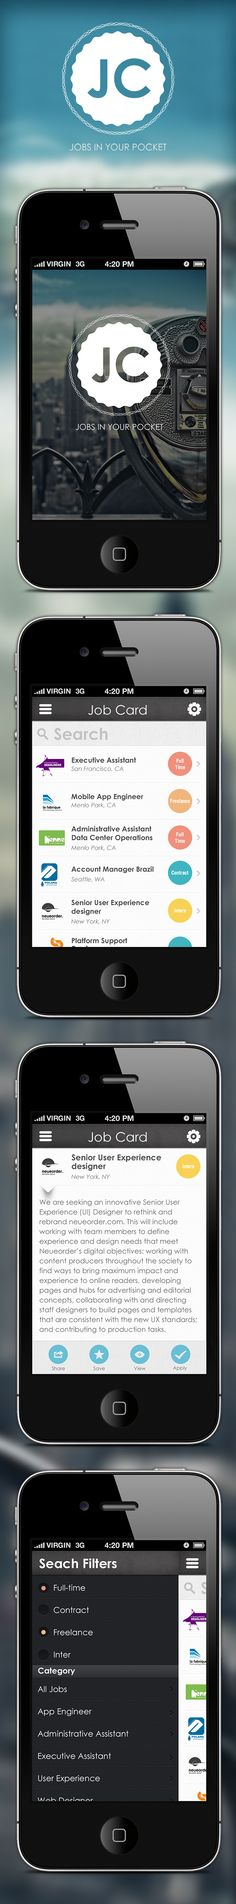 Job Cards - iPhone App by Asgar khan, via Behance